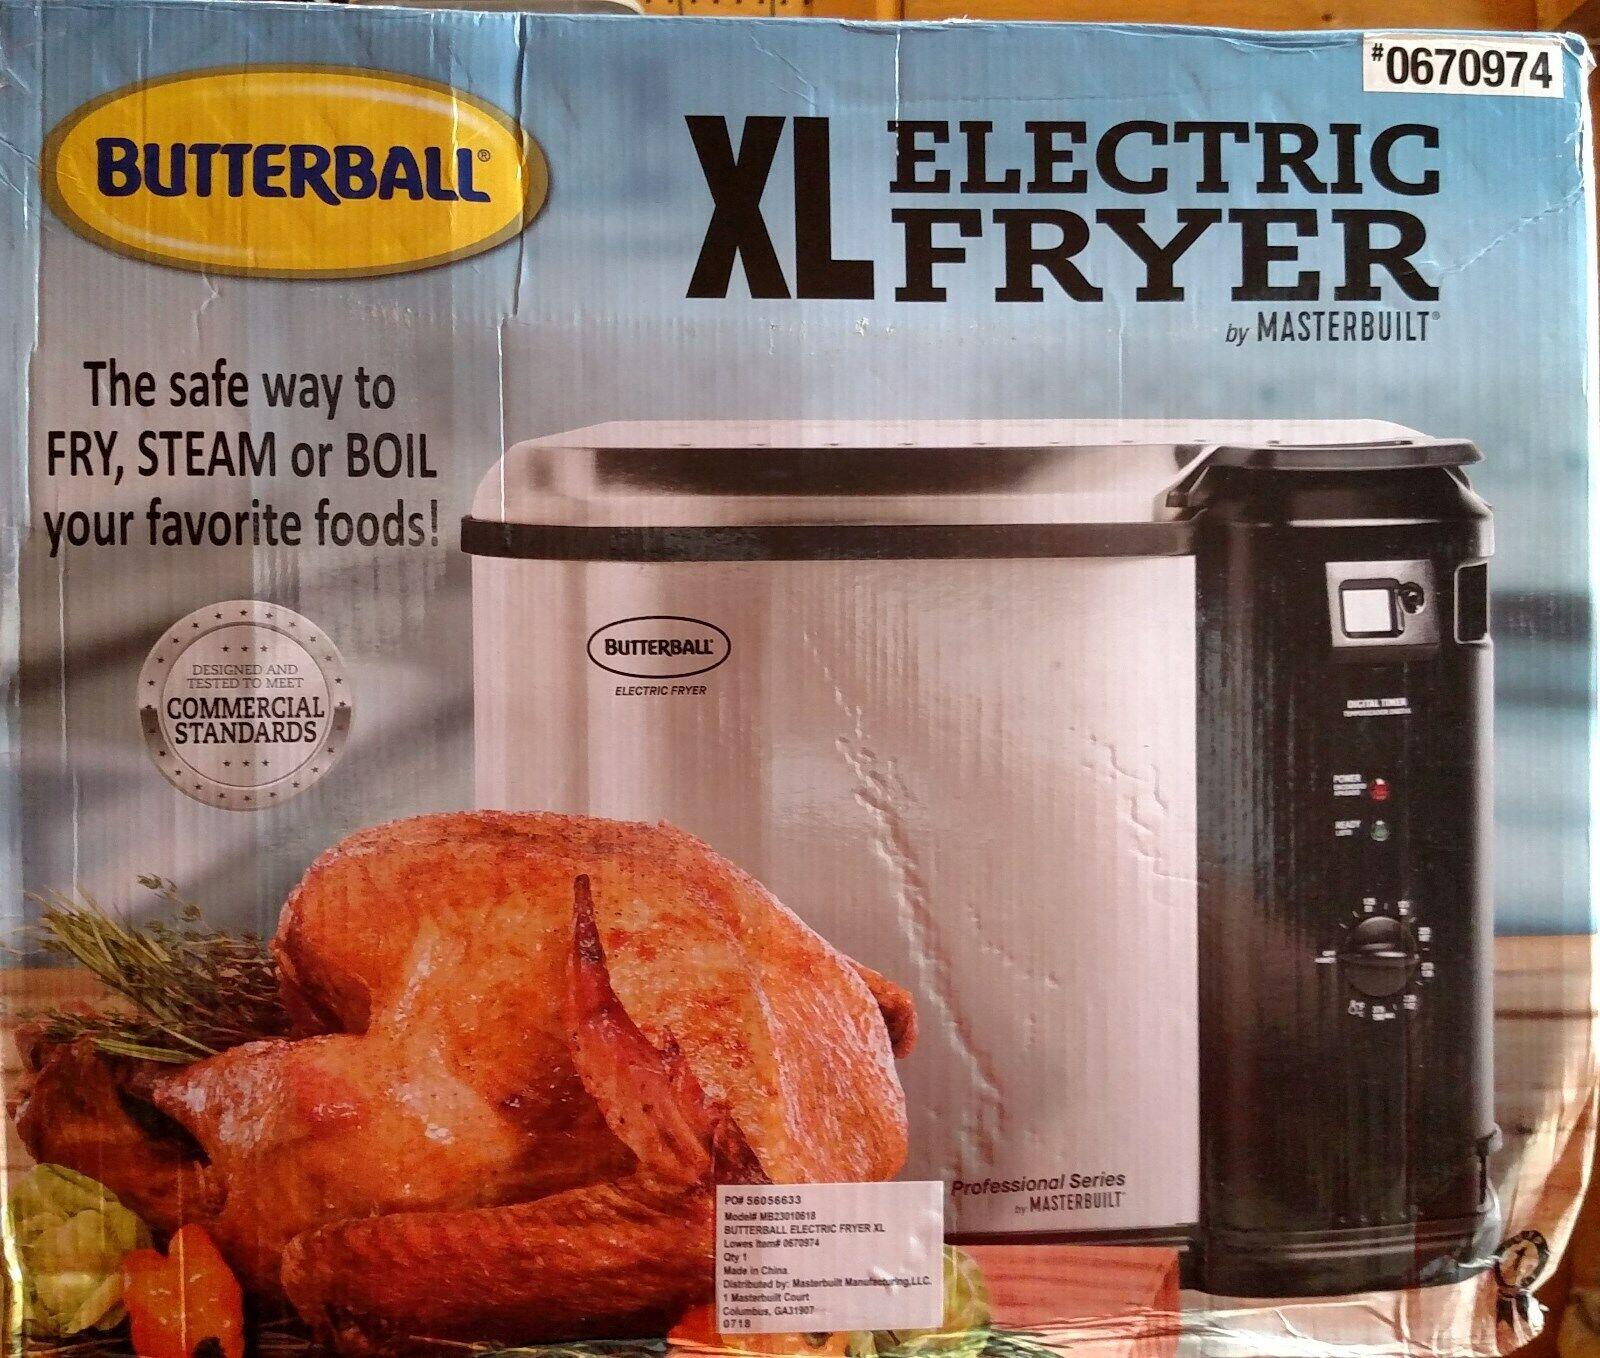 Mastrebuilt Butterball 23010618 XL Electric Fryer ~ NEW in B